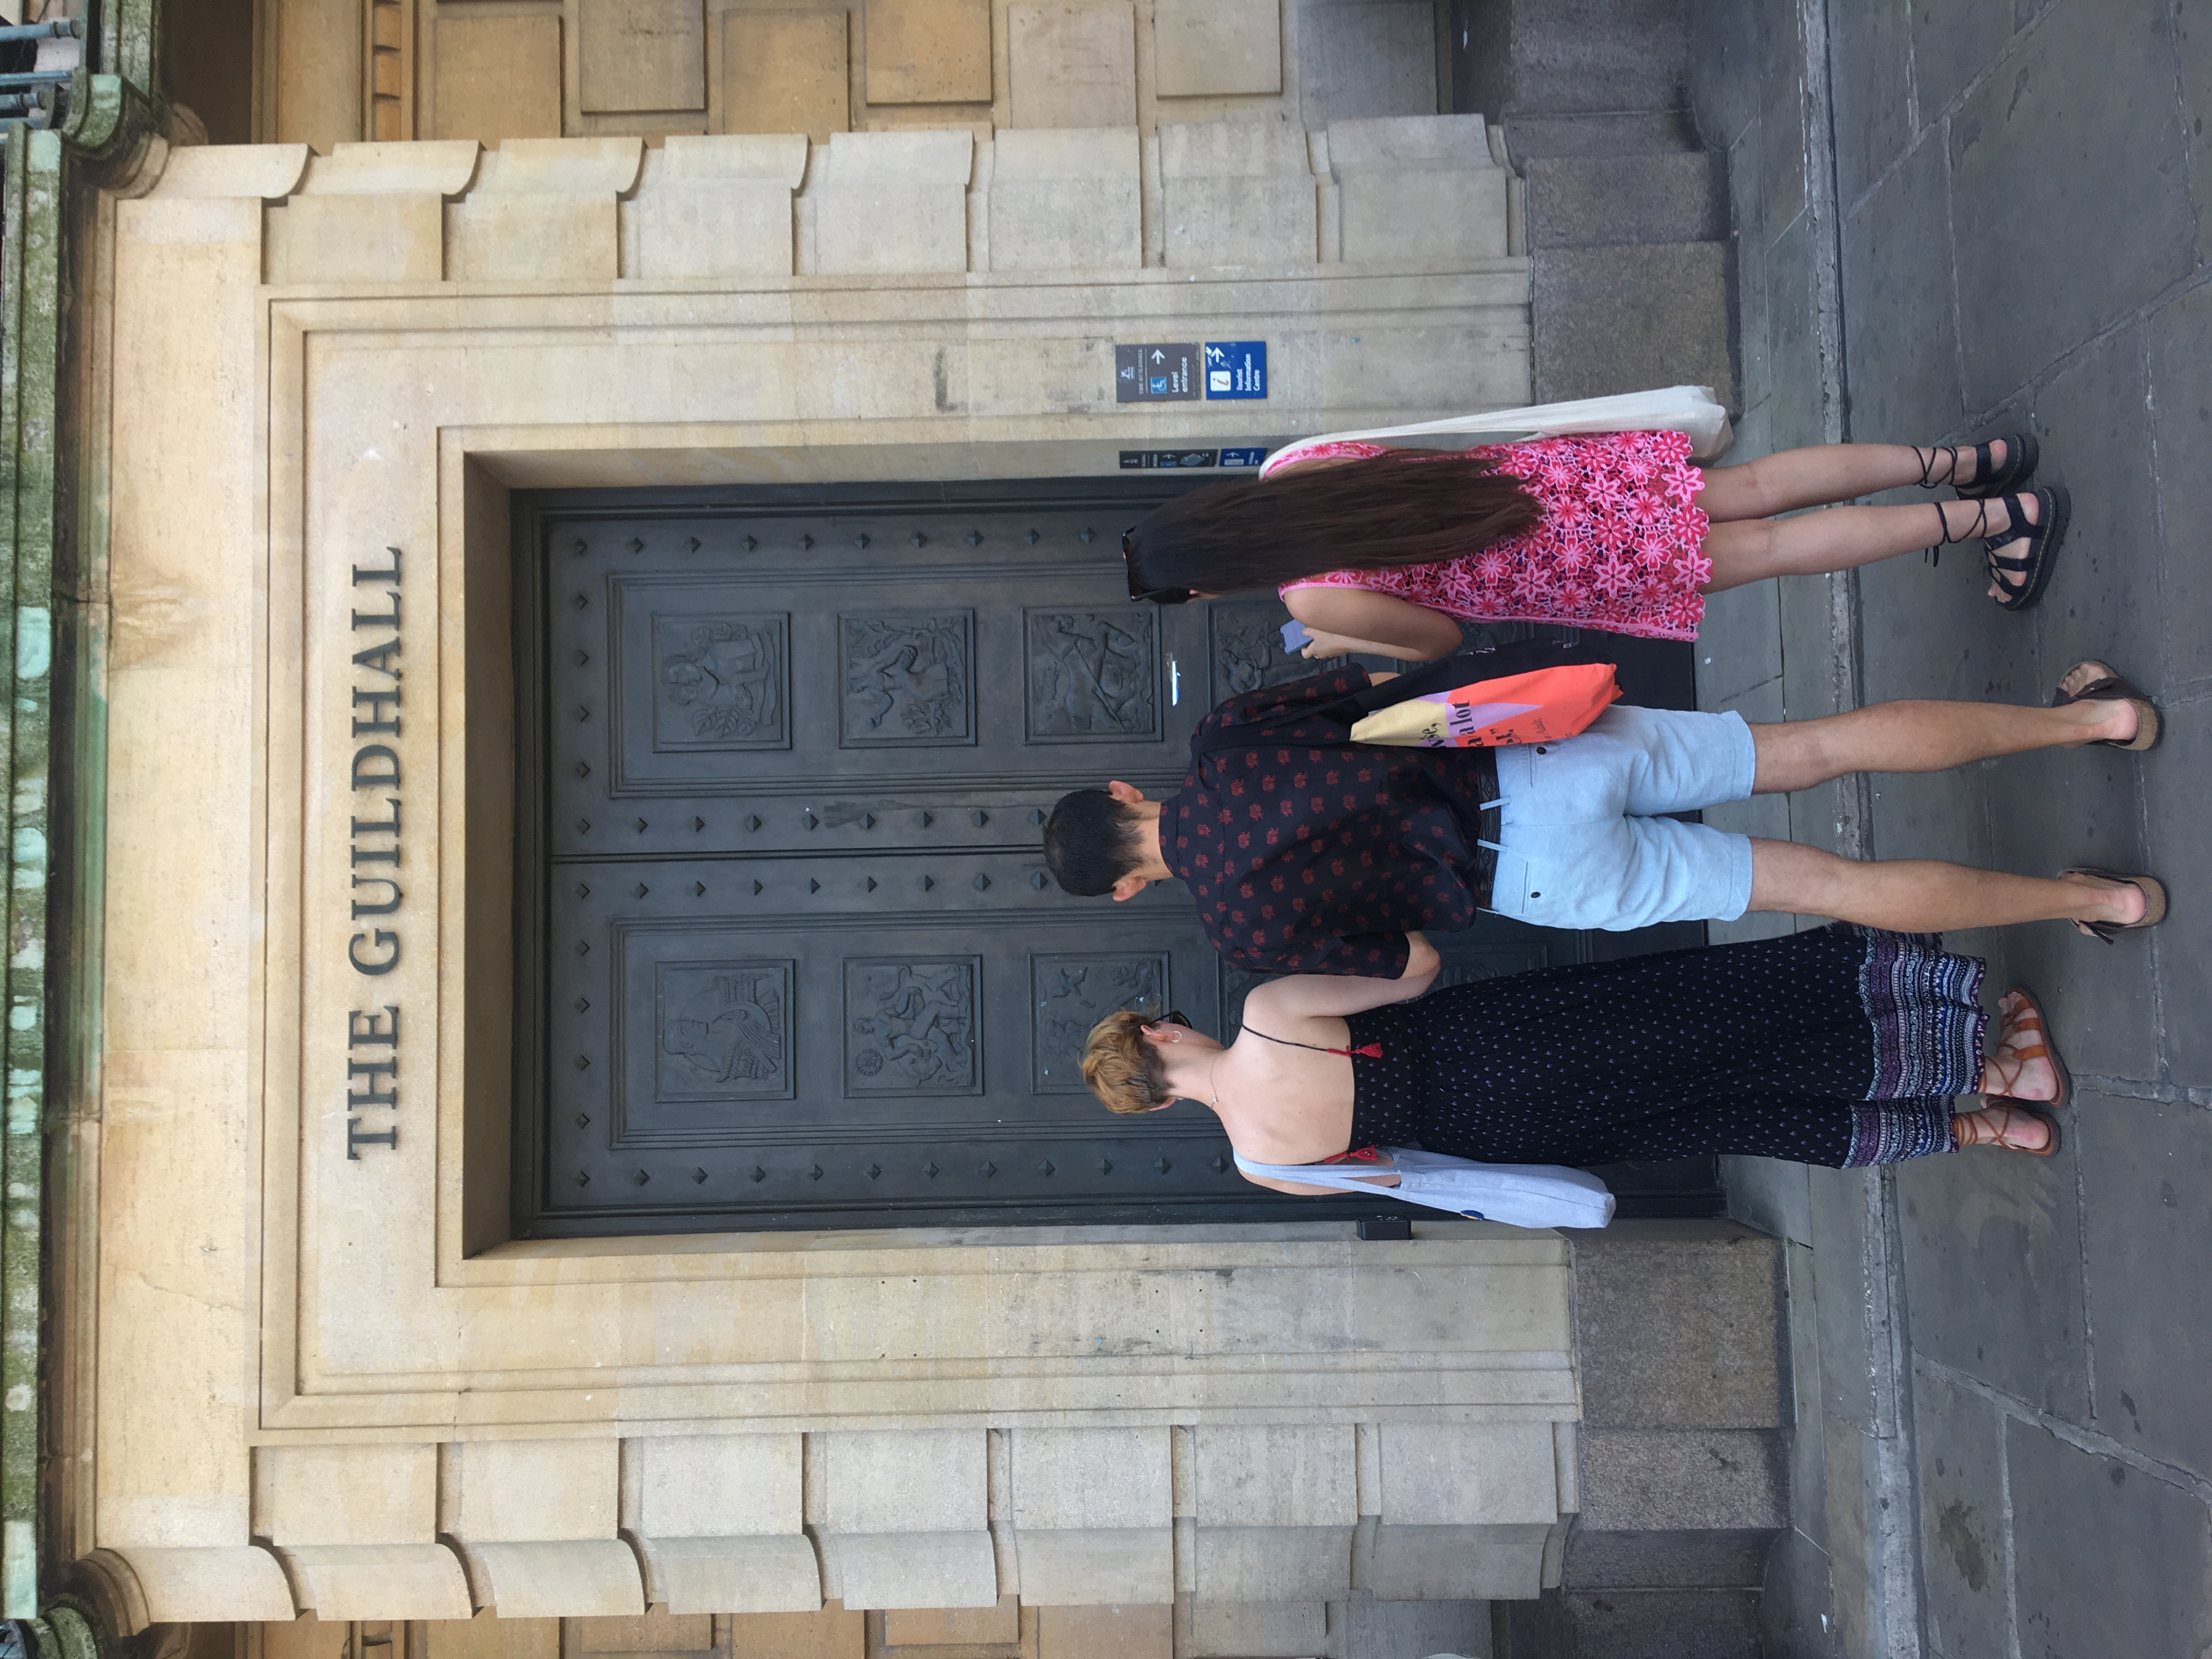 Famous alumni of Cambridge (QUEST IN TEST MODE) image